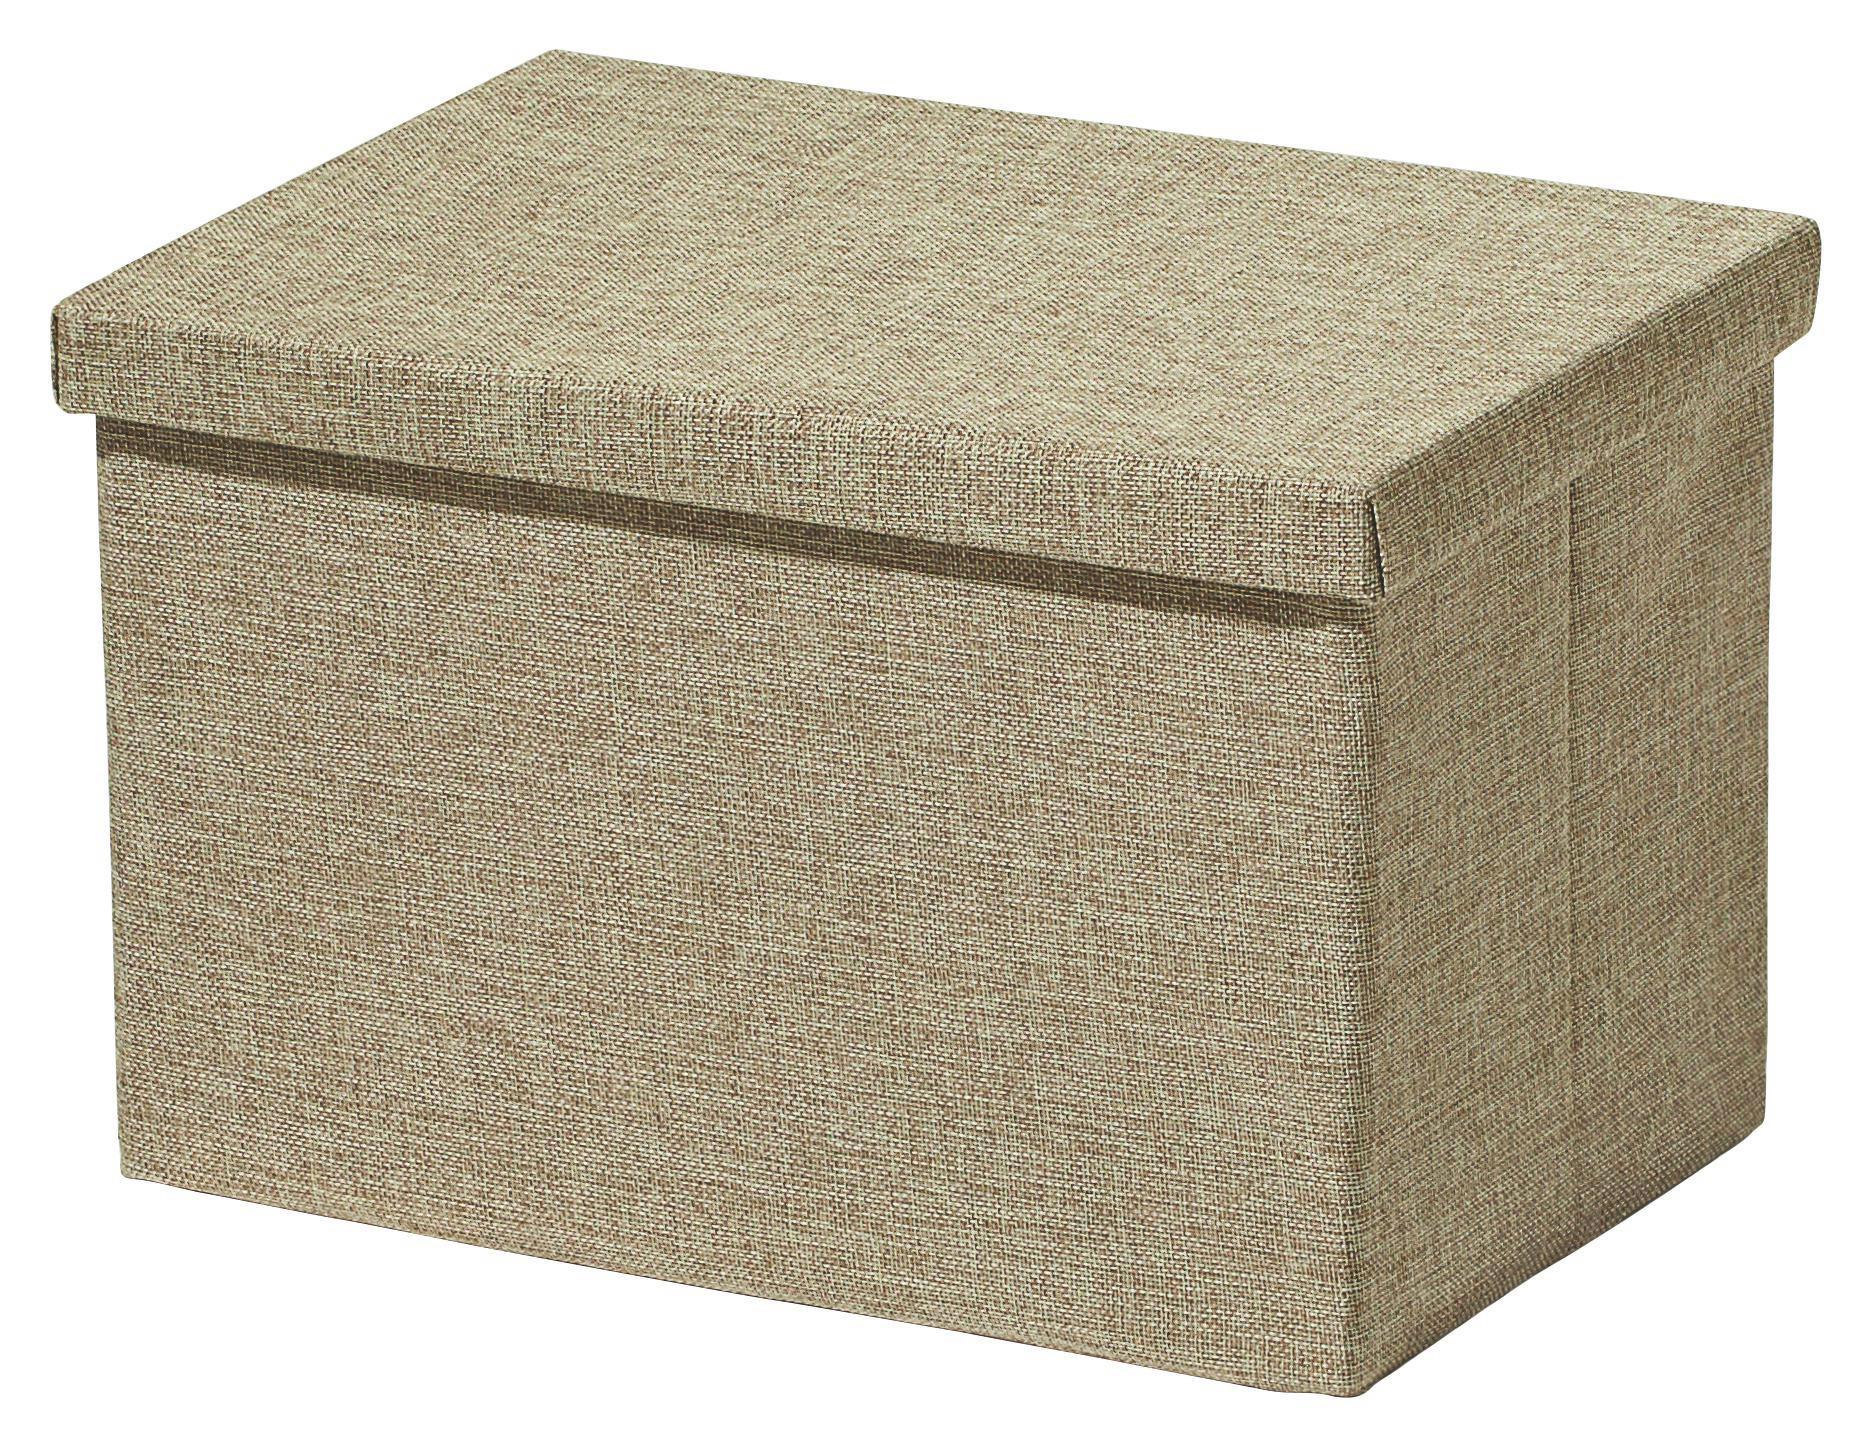 Aufbewahrungsbox Cindy - Beige, MODERN, Textil (38/26/24cm) - MÖMAX modern living